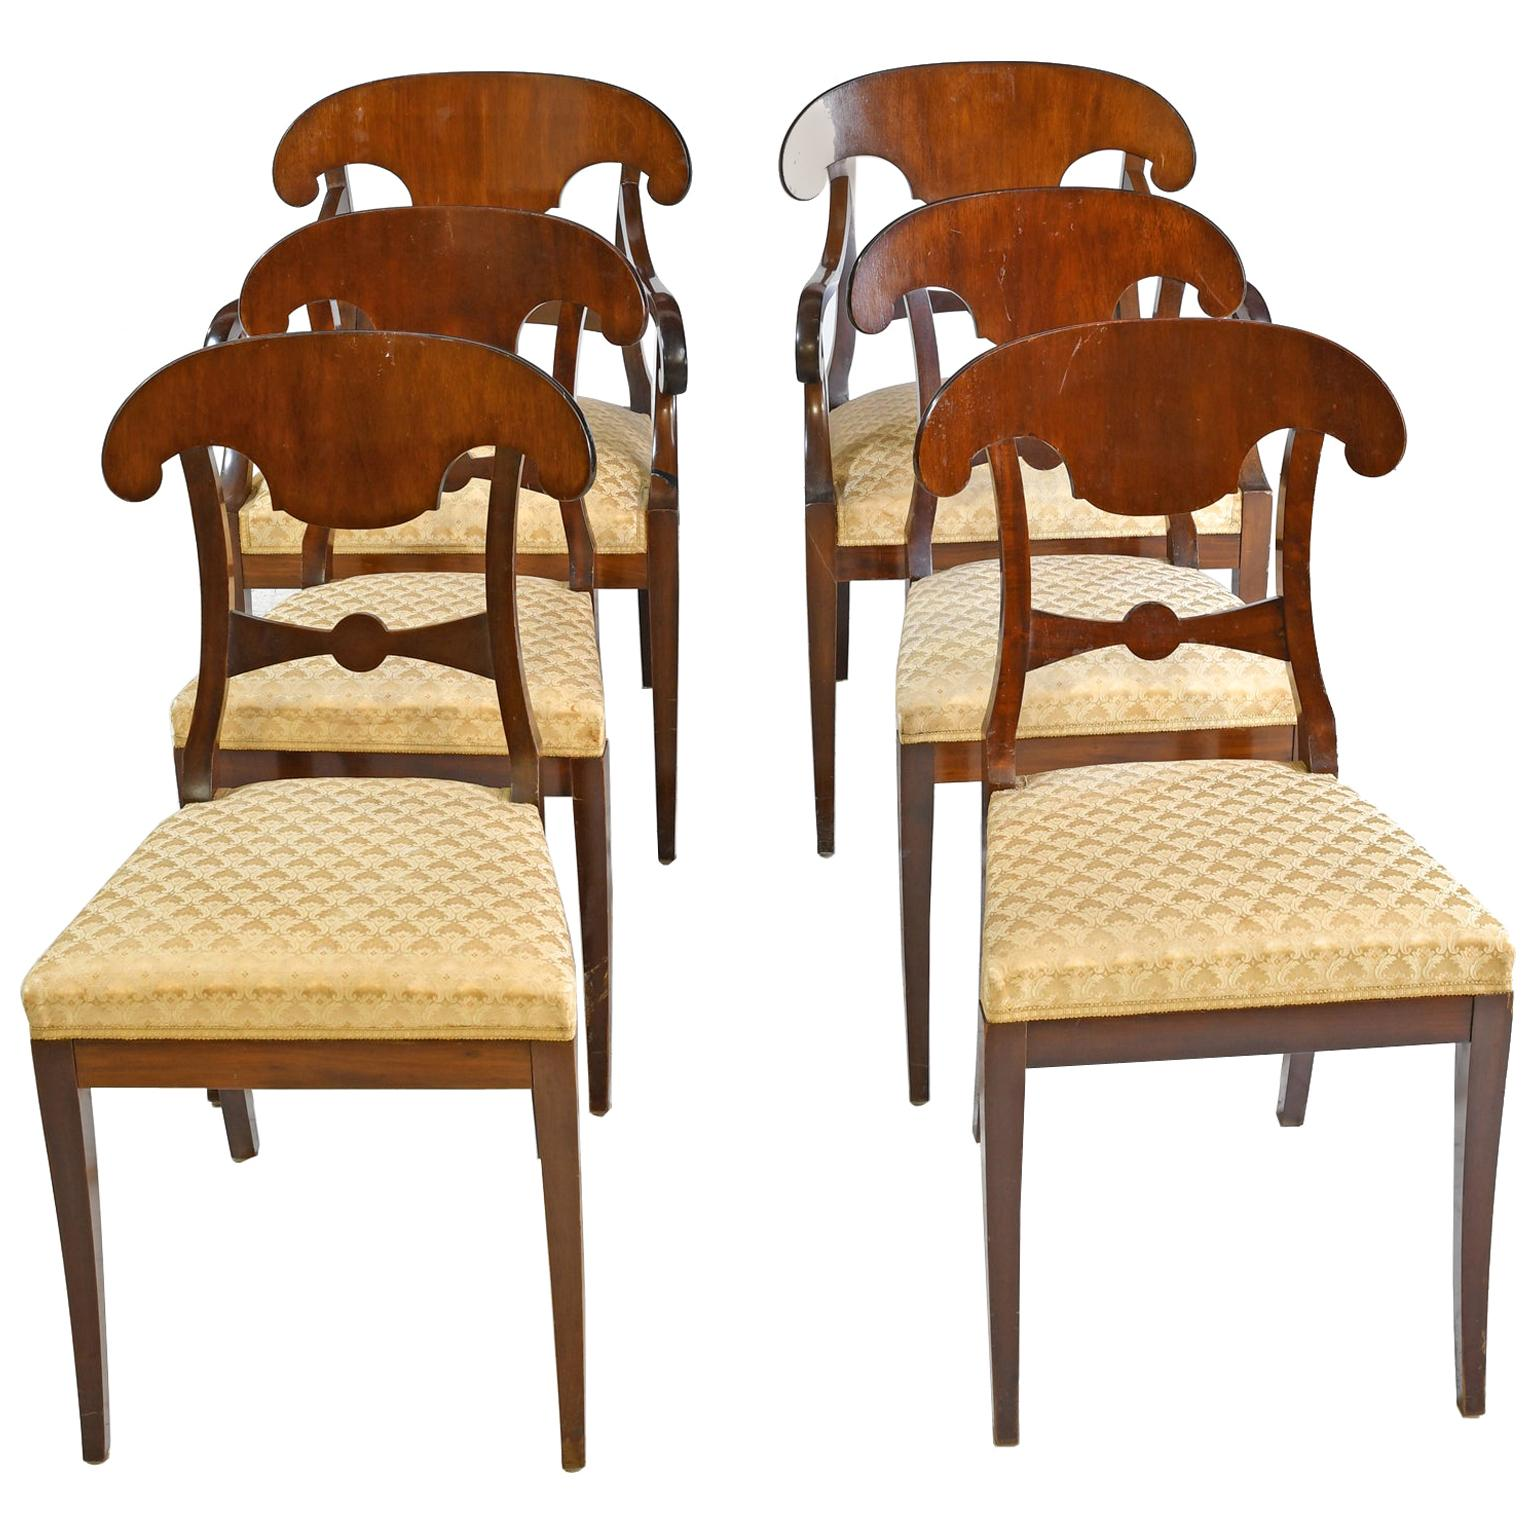 Set of 6 Swedish Karl Johan Dining Chairs in Mahogany, circa 1840-1860